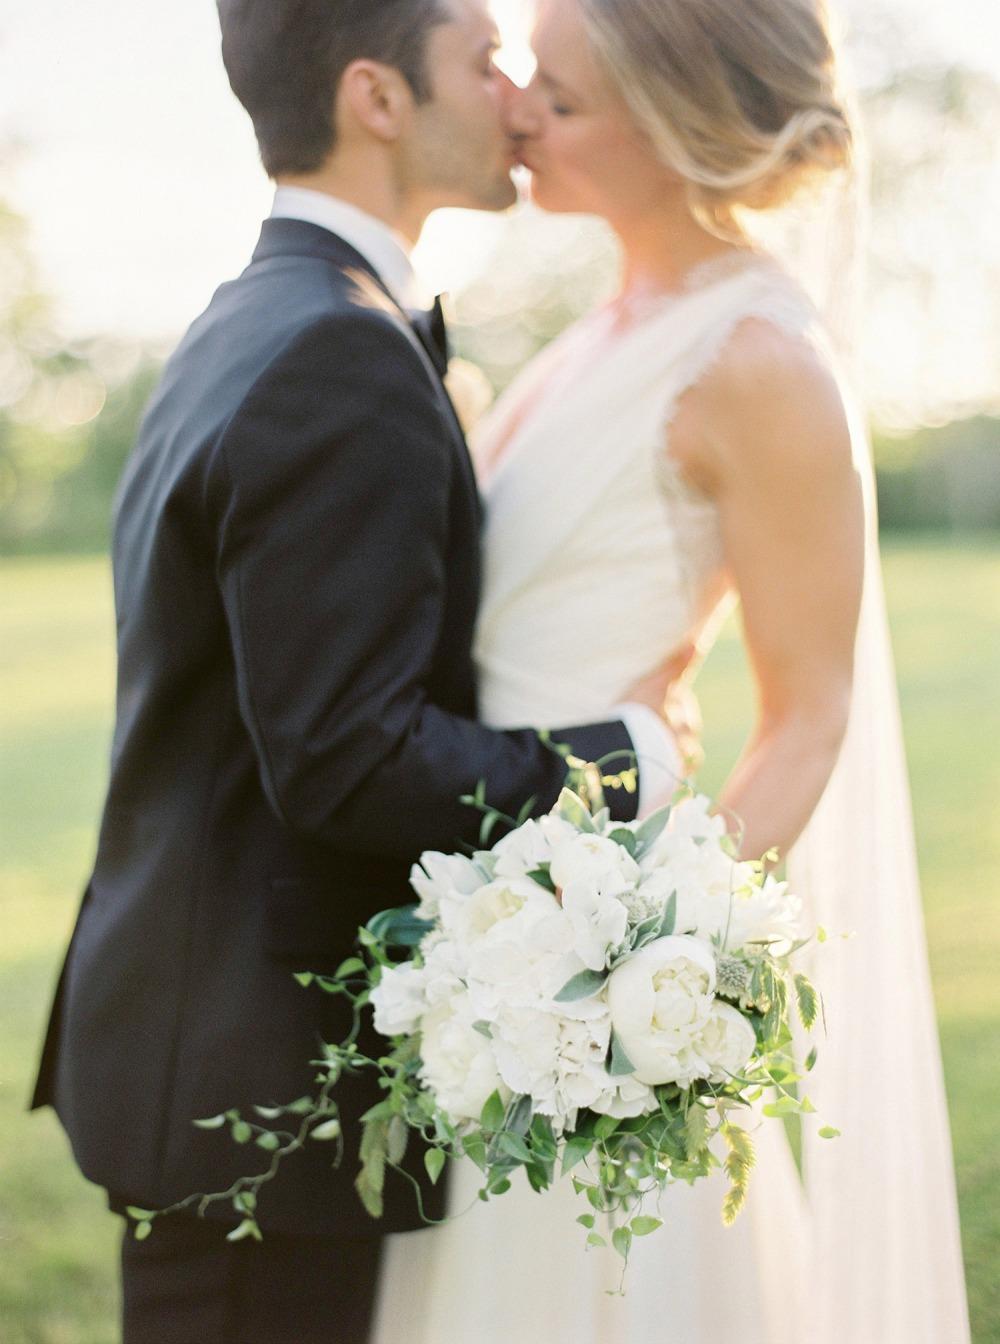 web-2bridesphotography_isabelle_weddings_006